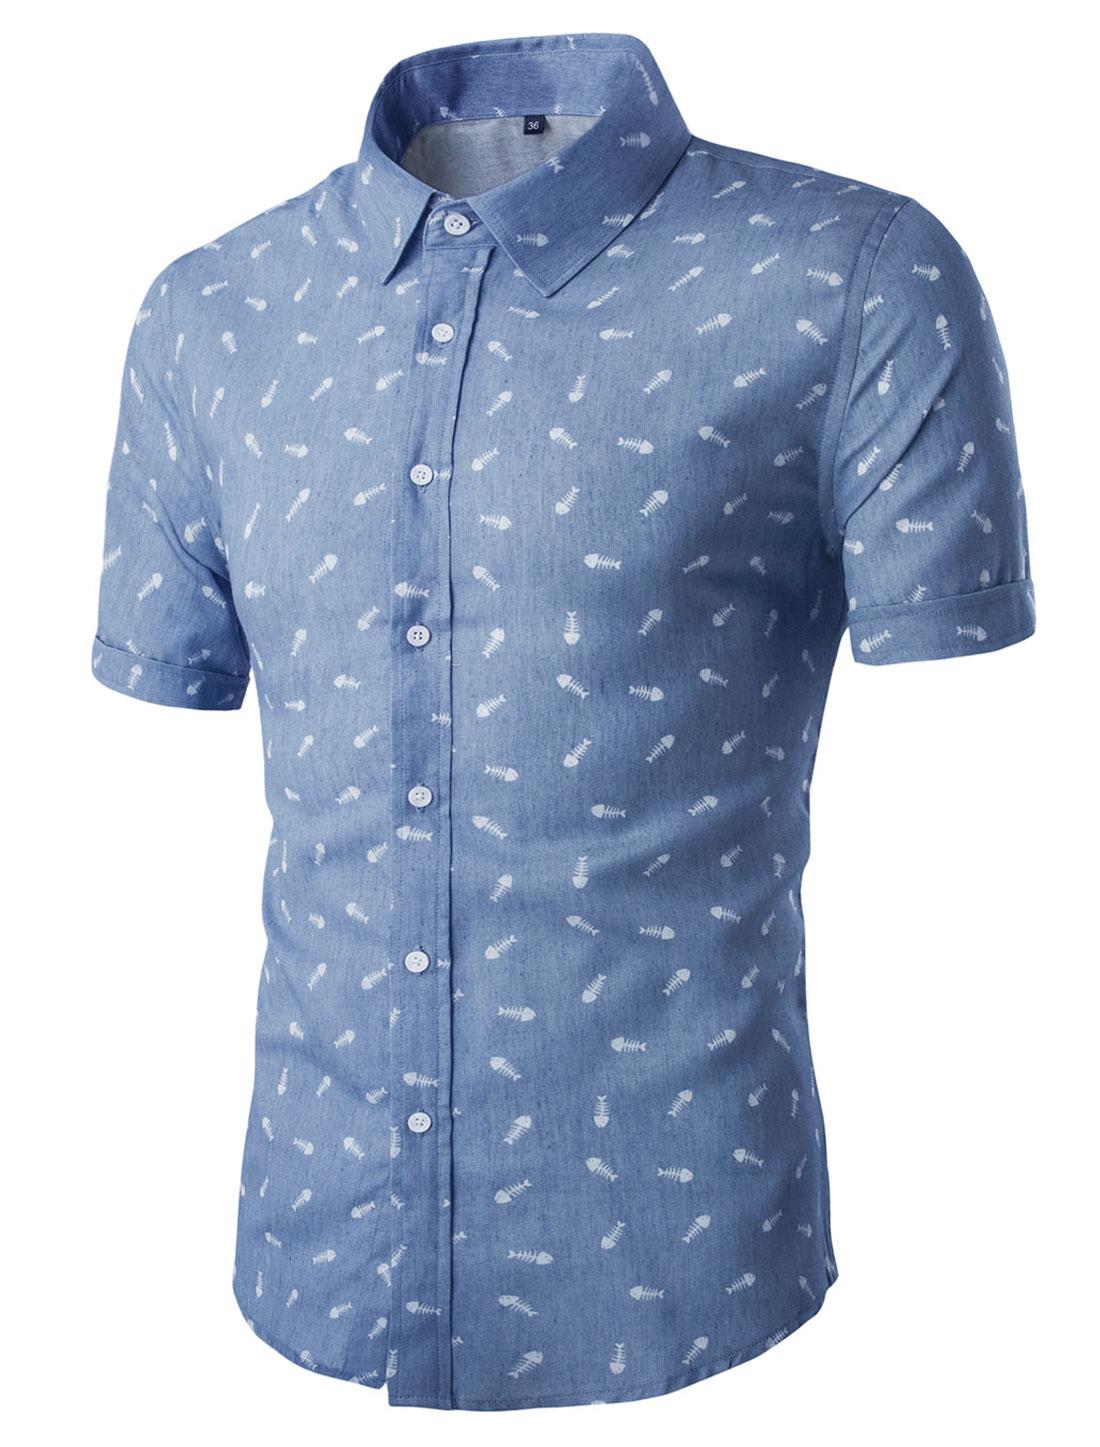 Men Short Sleeves Button Closed Fishbone Prints Cotton Shirt Blue M